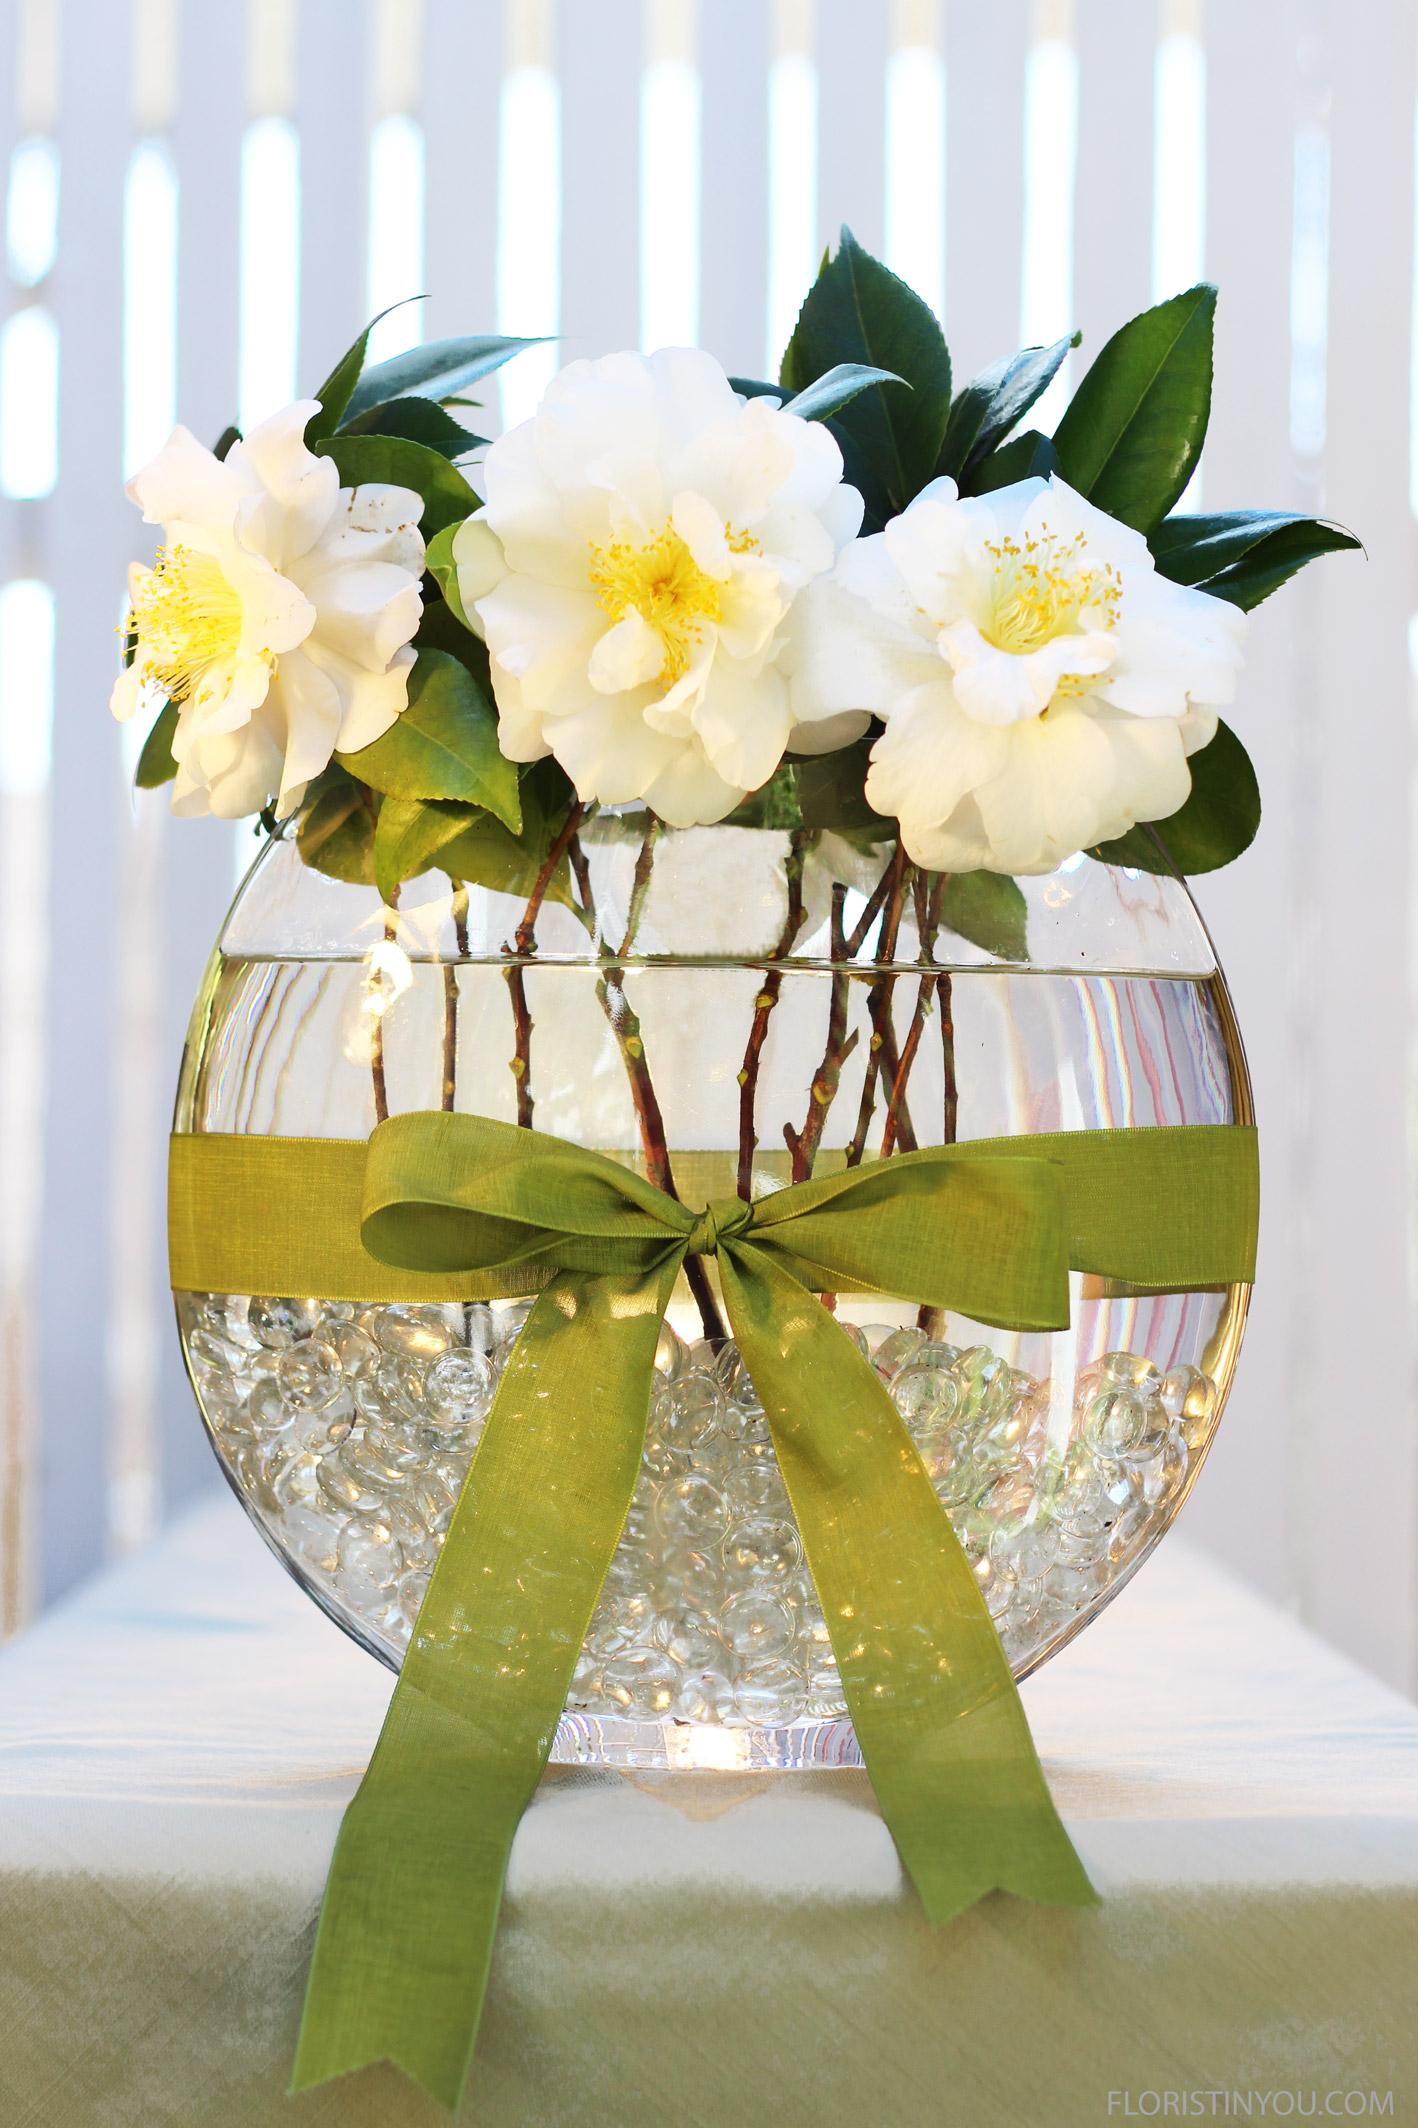 "White Camellias                     Normal   0           false   false   false     EN-US   JA   X-NONE                                                                                                                                                                                                                                                                                                                                                                              /* Style Definitions */ table.MsoNormalTable {mso-style-name:""Table Normal""; mso-tstyle-rowband-size:0; mso-tstyle-colband-size:0; mso-style-noshow:yes; mso-style-priority:99; mso-style-parent:""""; mso-padding-alt:0in 5.4pt 0in 5.4pt; mso-para-margin:0in; mso-para-margin-bottom:.0001pt; mso-pagination:widow-orphan; font-size:12.0pt; font-family:Cambria; mso-ascii-font-family:Cambria; mso-ascii-theme-font:minor-latin; mso-hansi-font-family:Cambria; mso-hansi-theme-font:minor-latin;}"